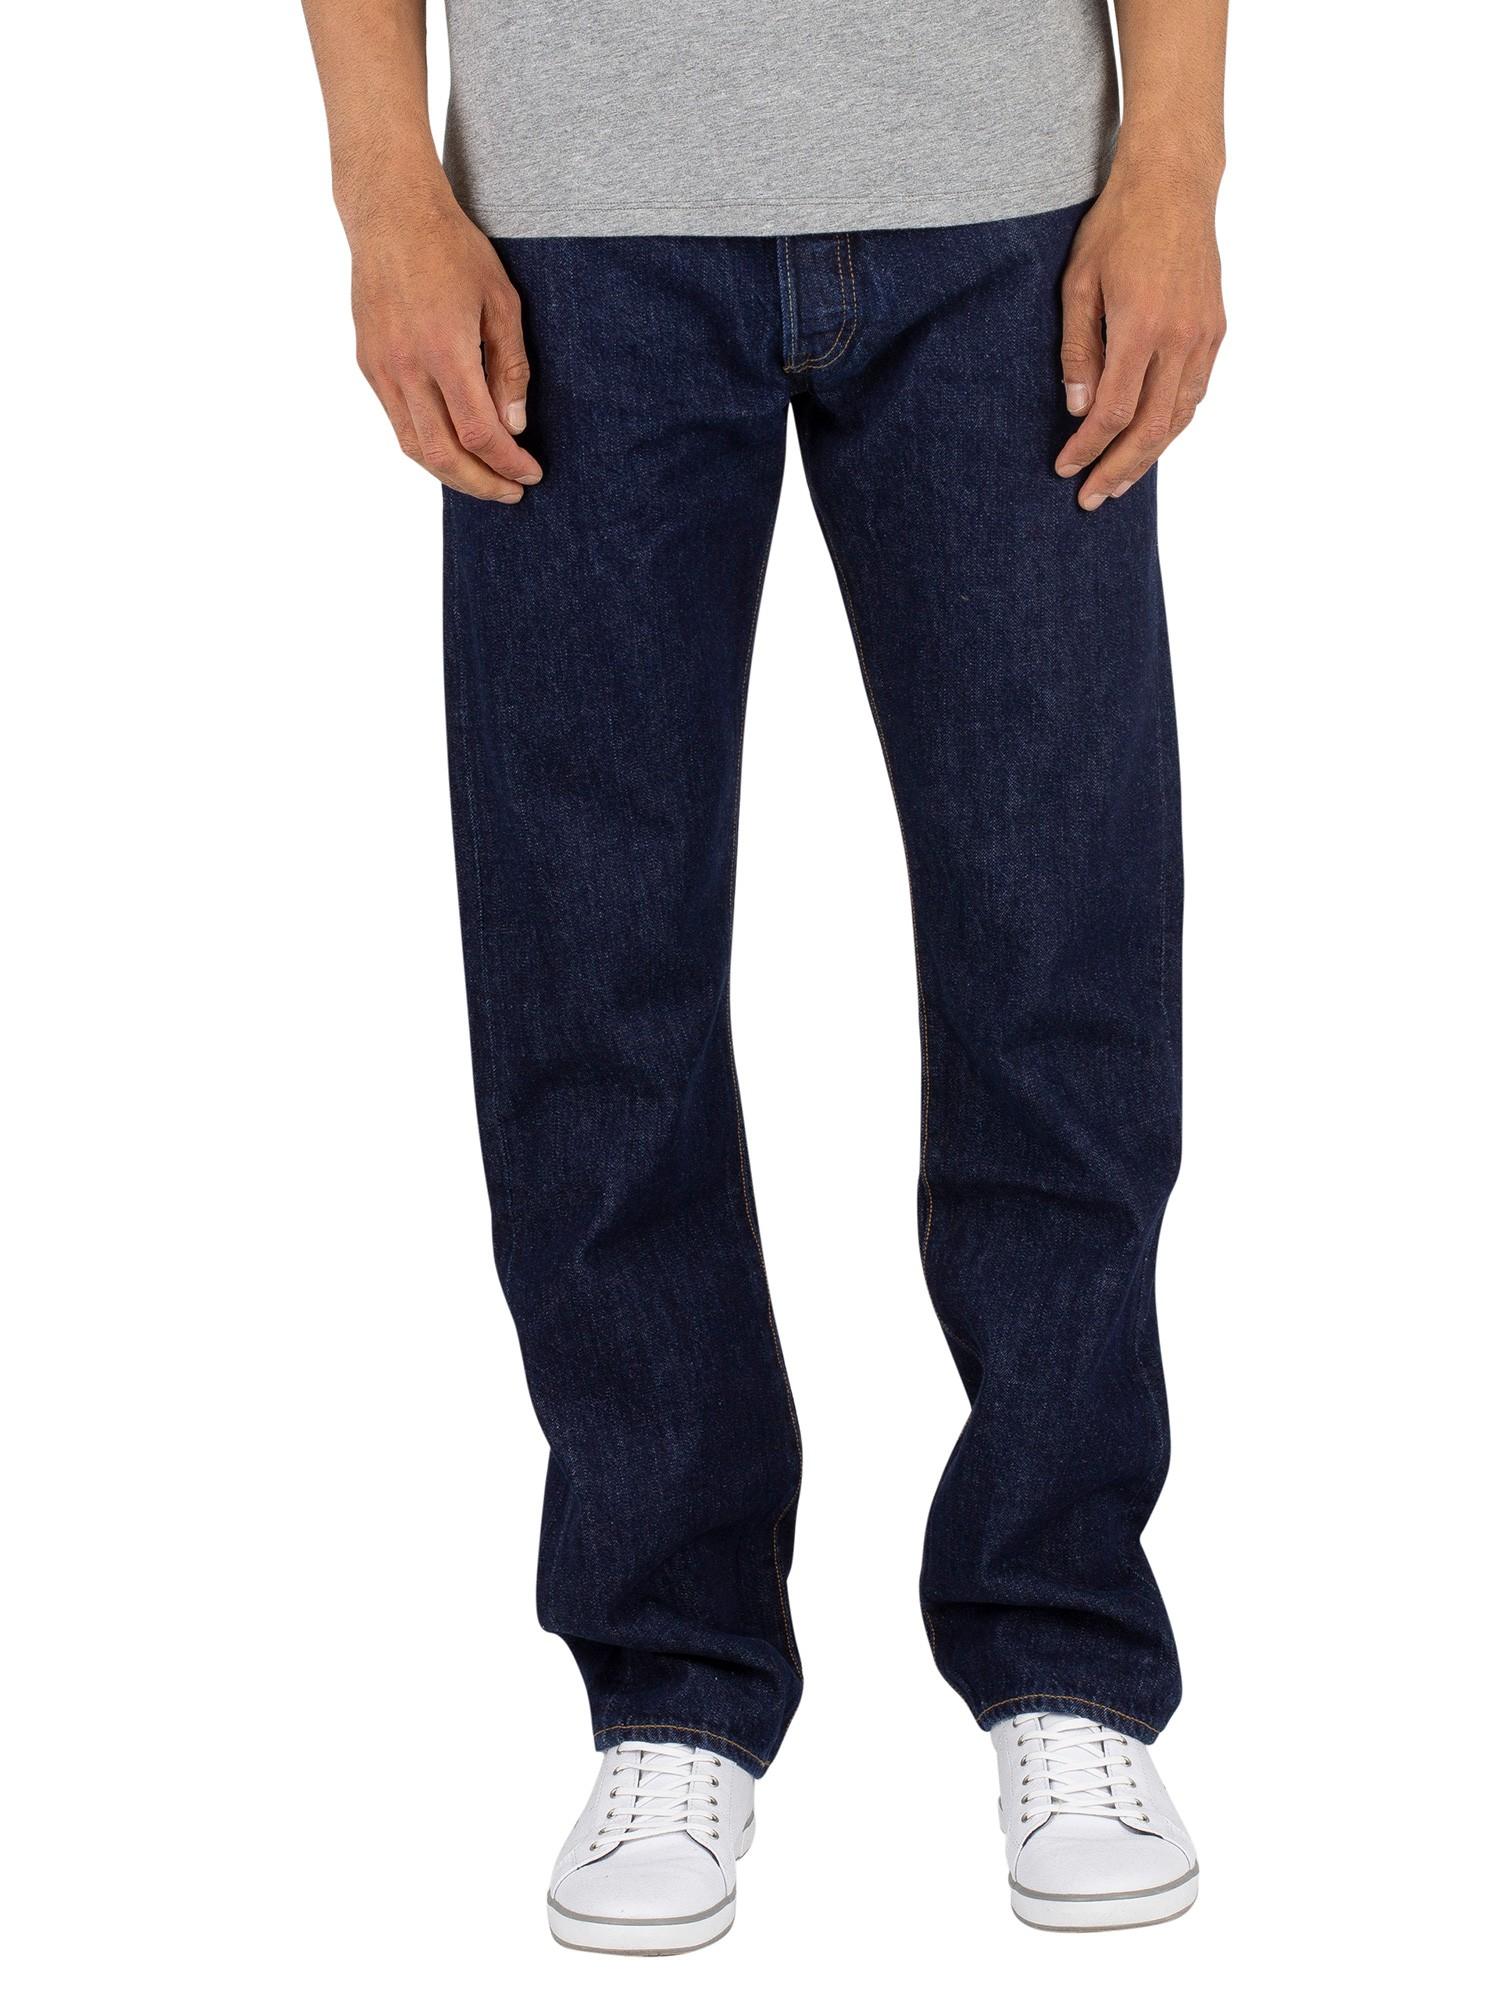 levi 39 s onewash 501 original fit jeans stand out. Black Bedroom Furniture Sets. Home Design Ideas